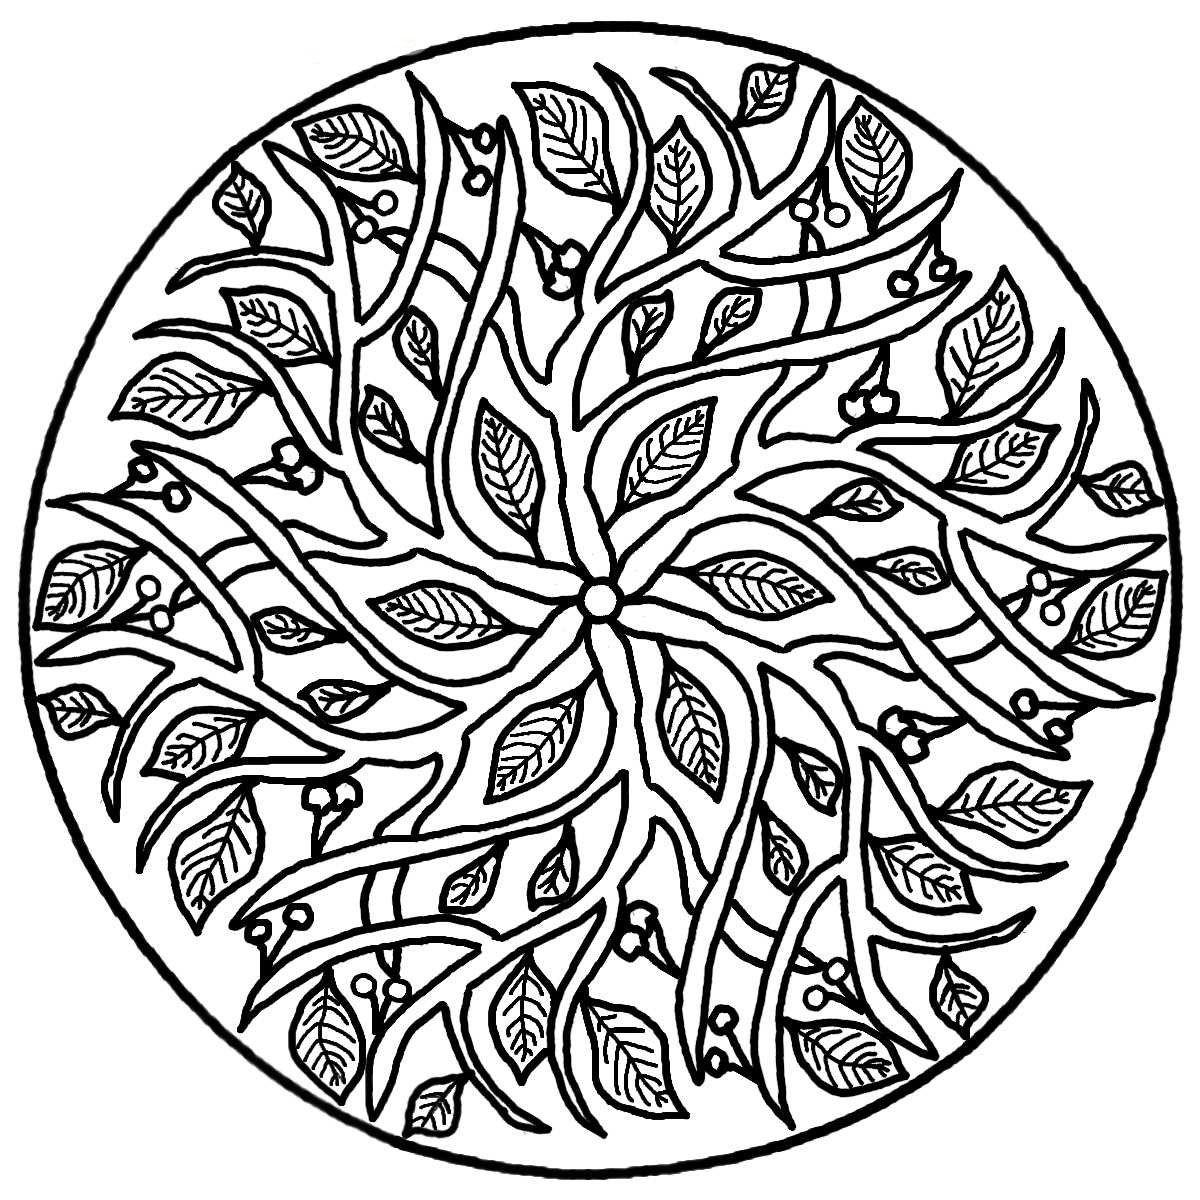 mandala de flores para colorear e imprimir | mandalas para colorear ...